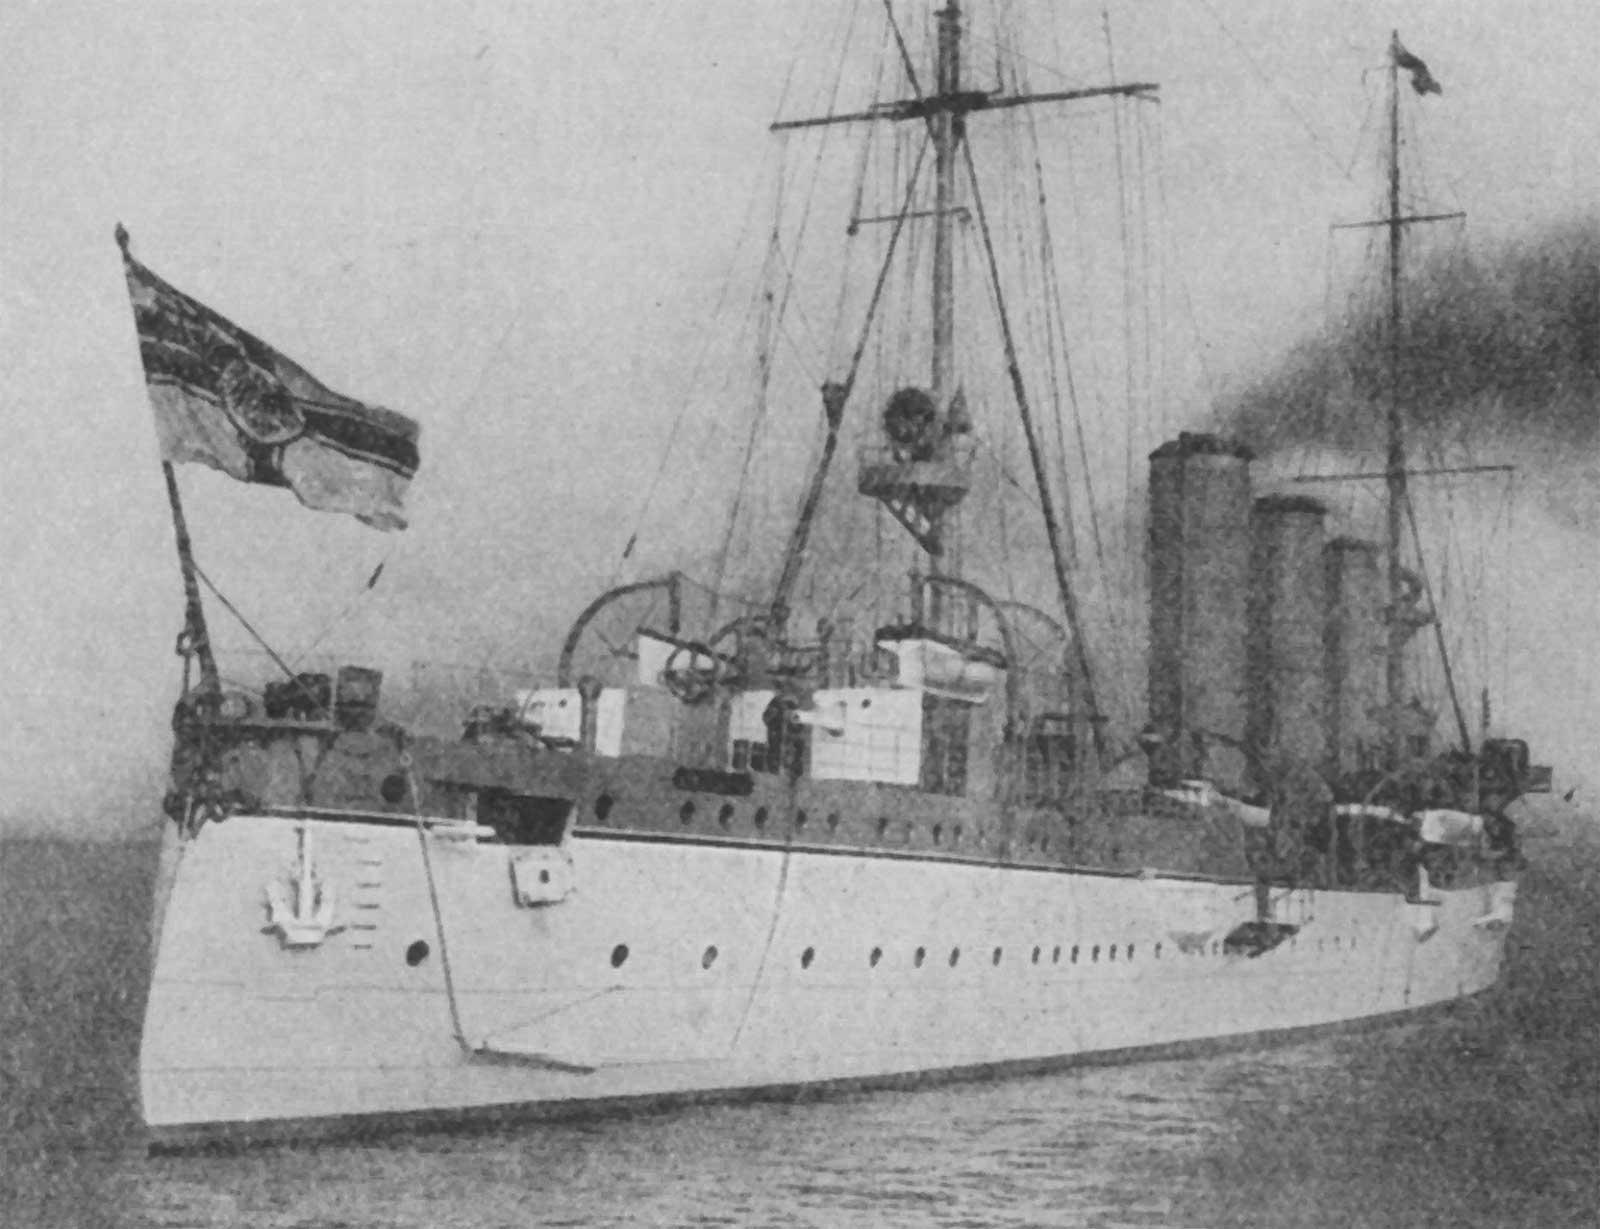 SMS Königsberg, the cruiser that surprised the HMS Pegasus in repairs